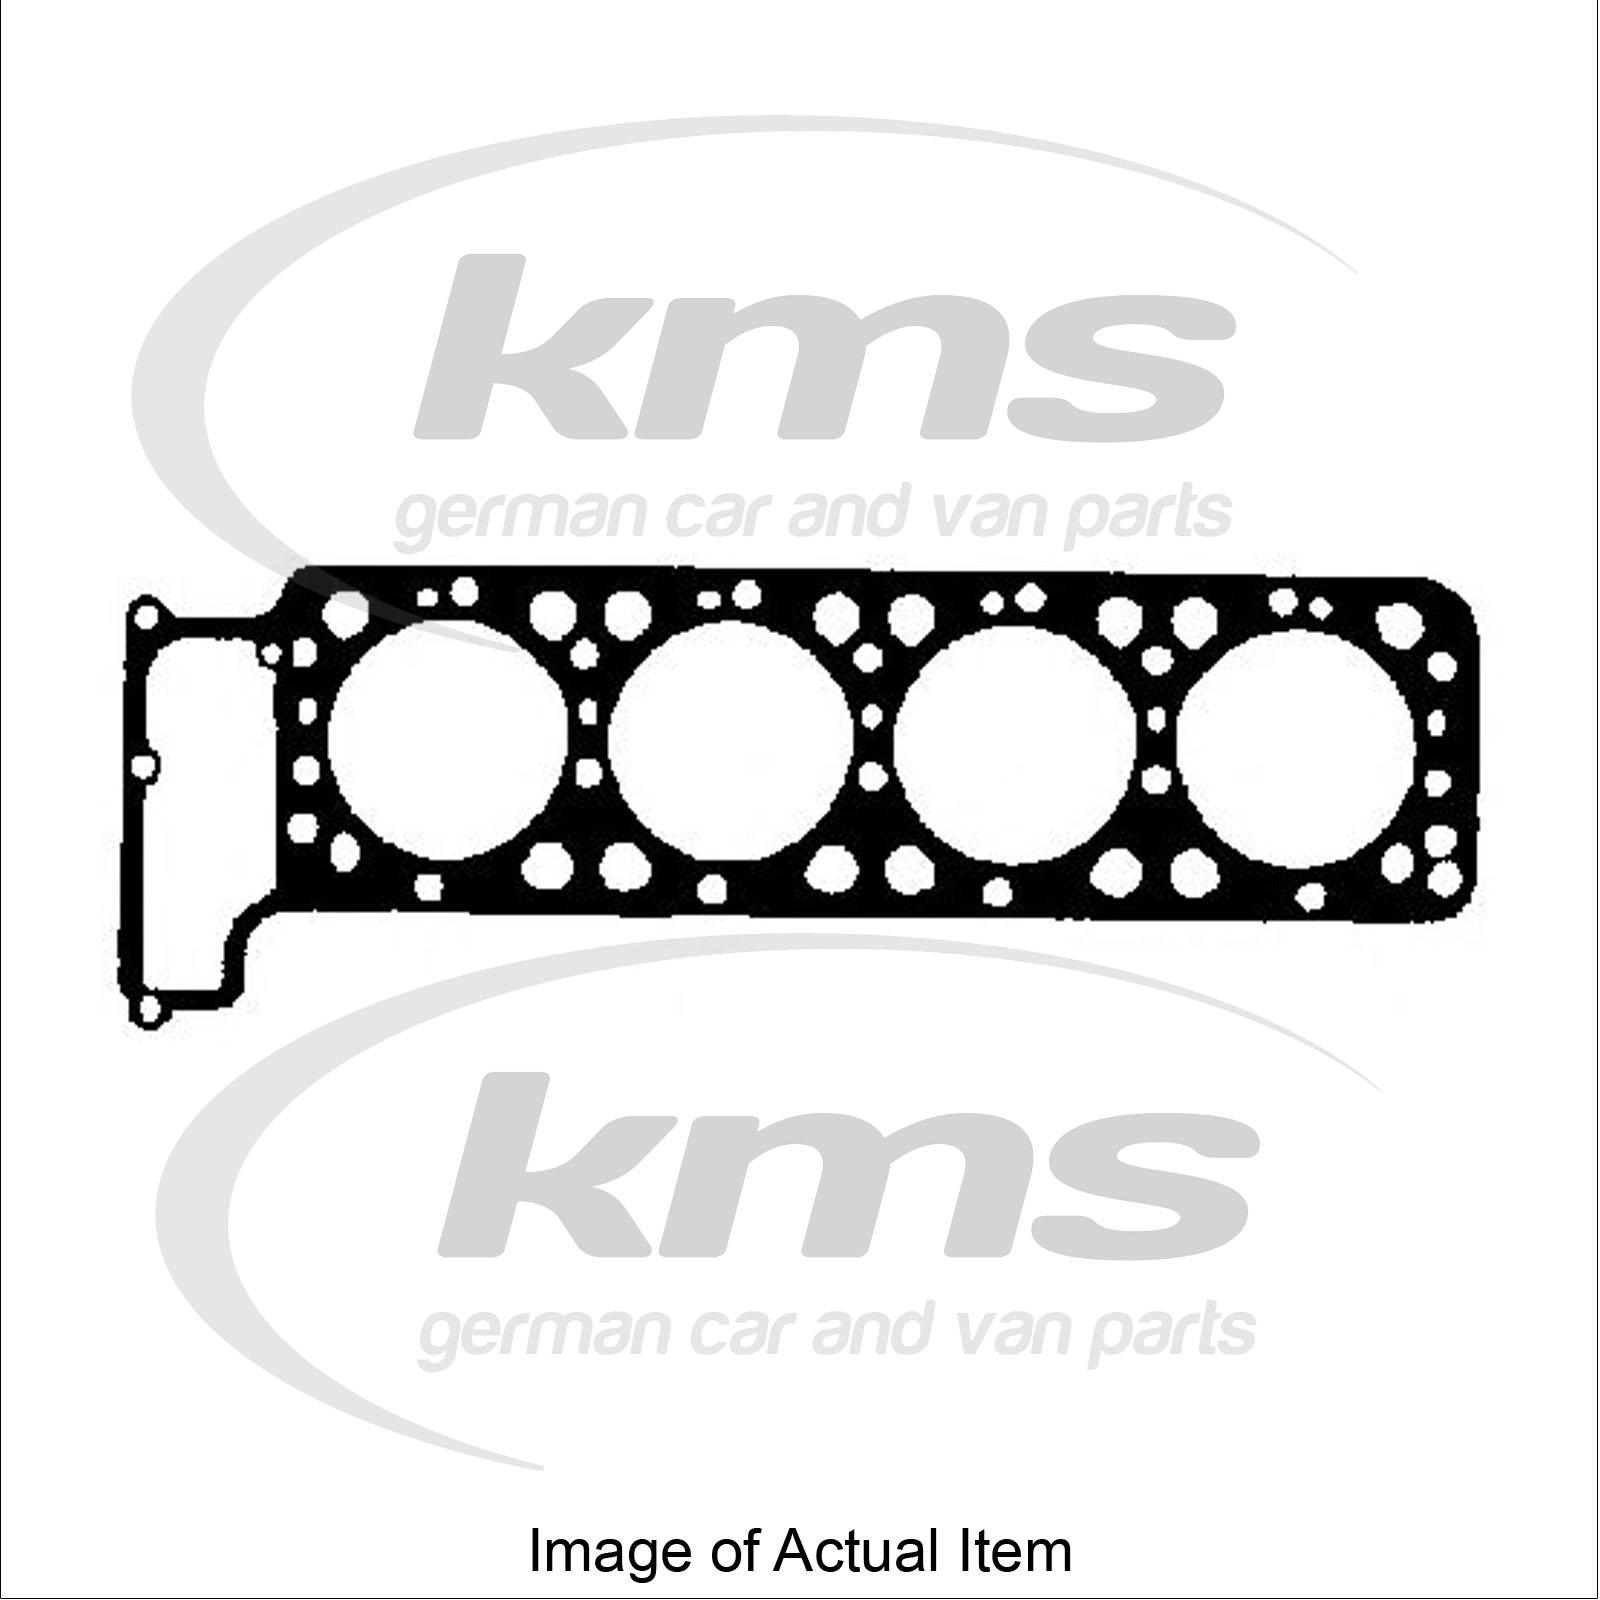 Gasket For Cylinder Head Mercedes Cabriolet W111 280 Se 3 5 111 025 Converti